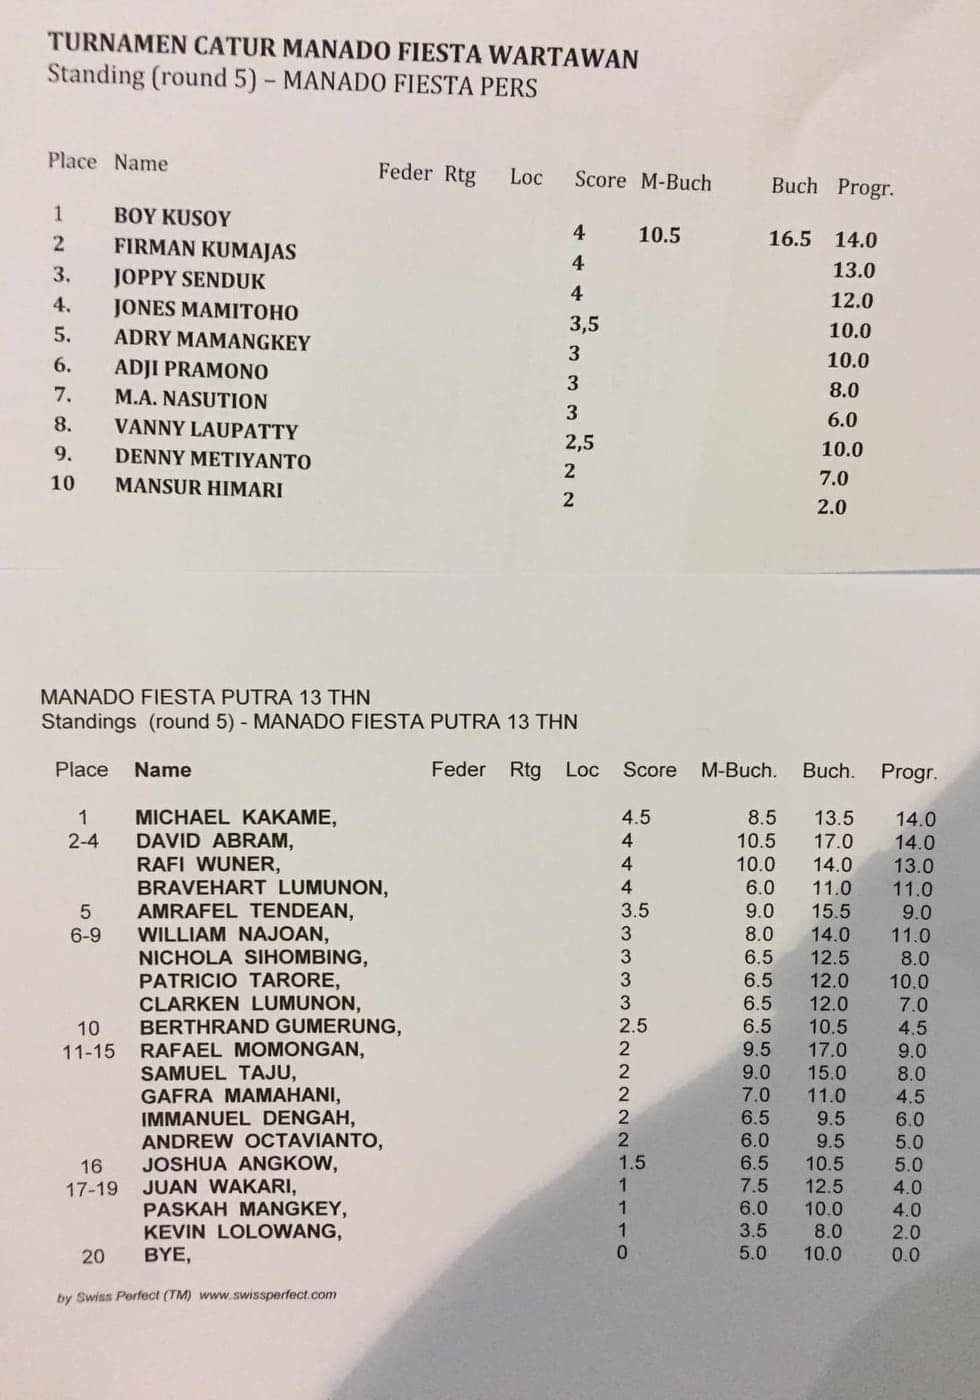 Berikut daftar pemenang Kejuaraan Catur Trophy Wali Kota yang digelar oleh Dinas Pemuda dan Olahraga (Dispora) dalam rangka meramaikan Manado Fiesta 2019